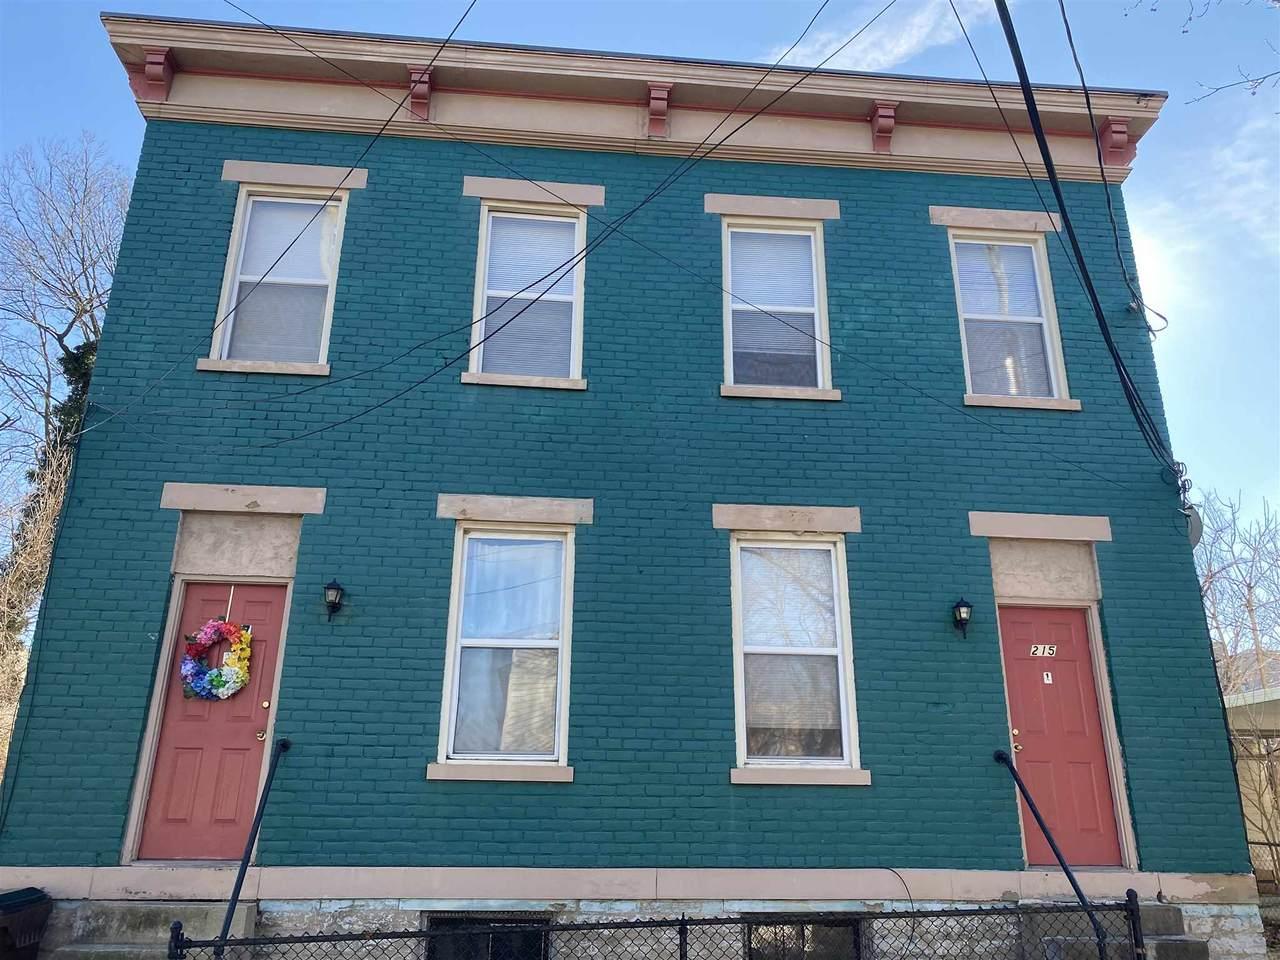 215-17 10th Street - Photo 1